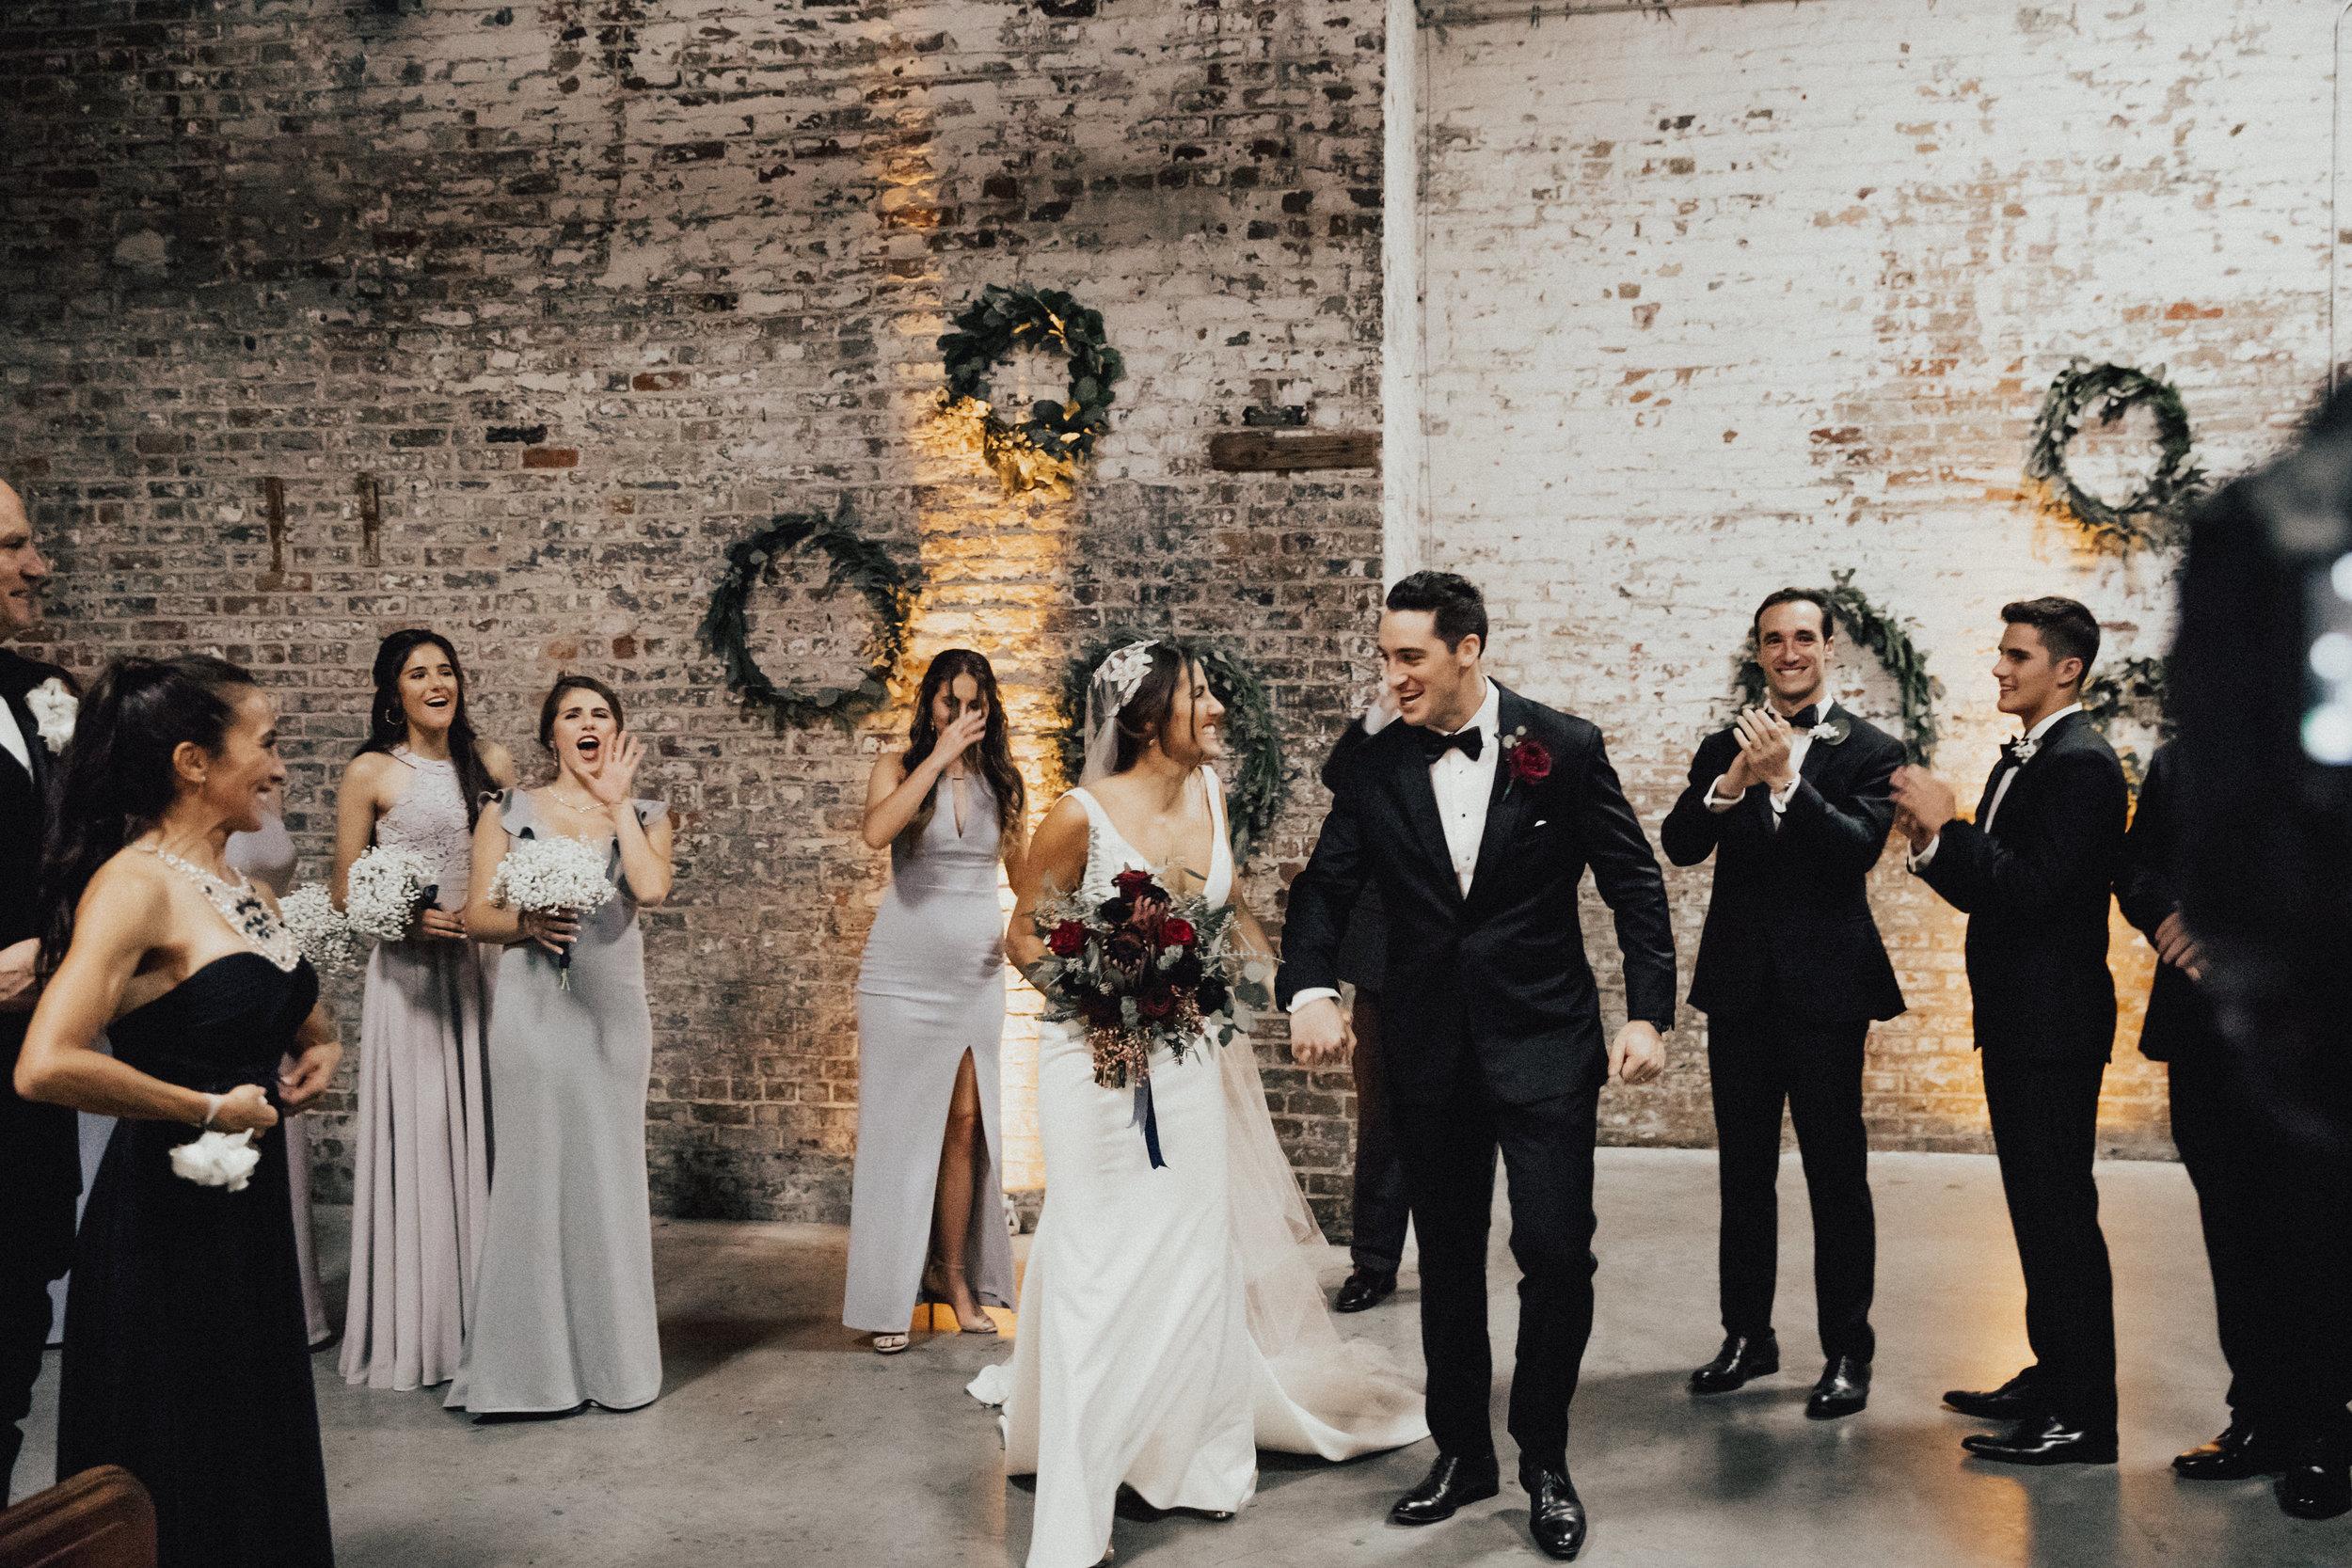 magners wedding (68 of 145).jpg